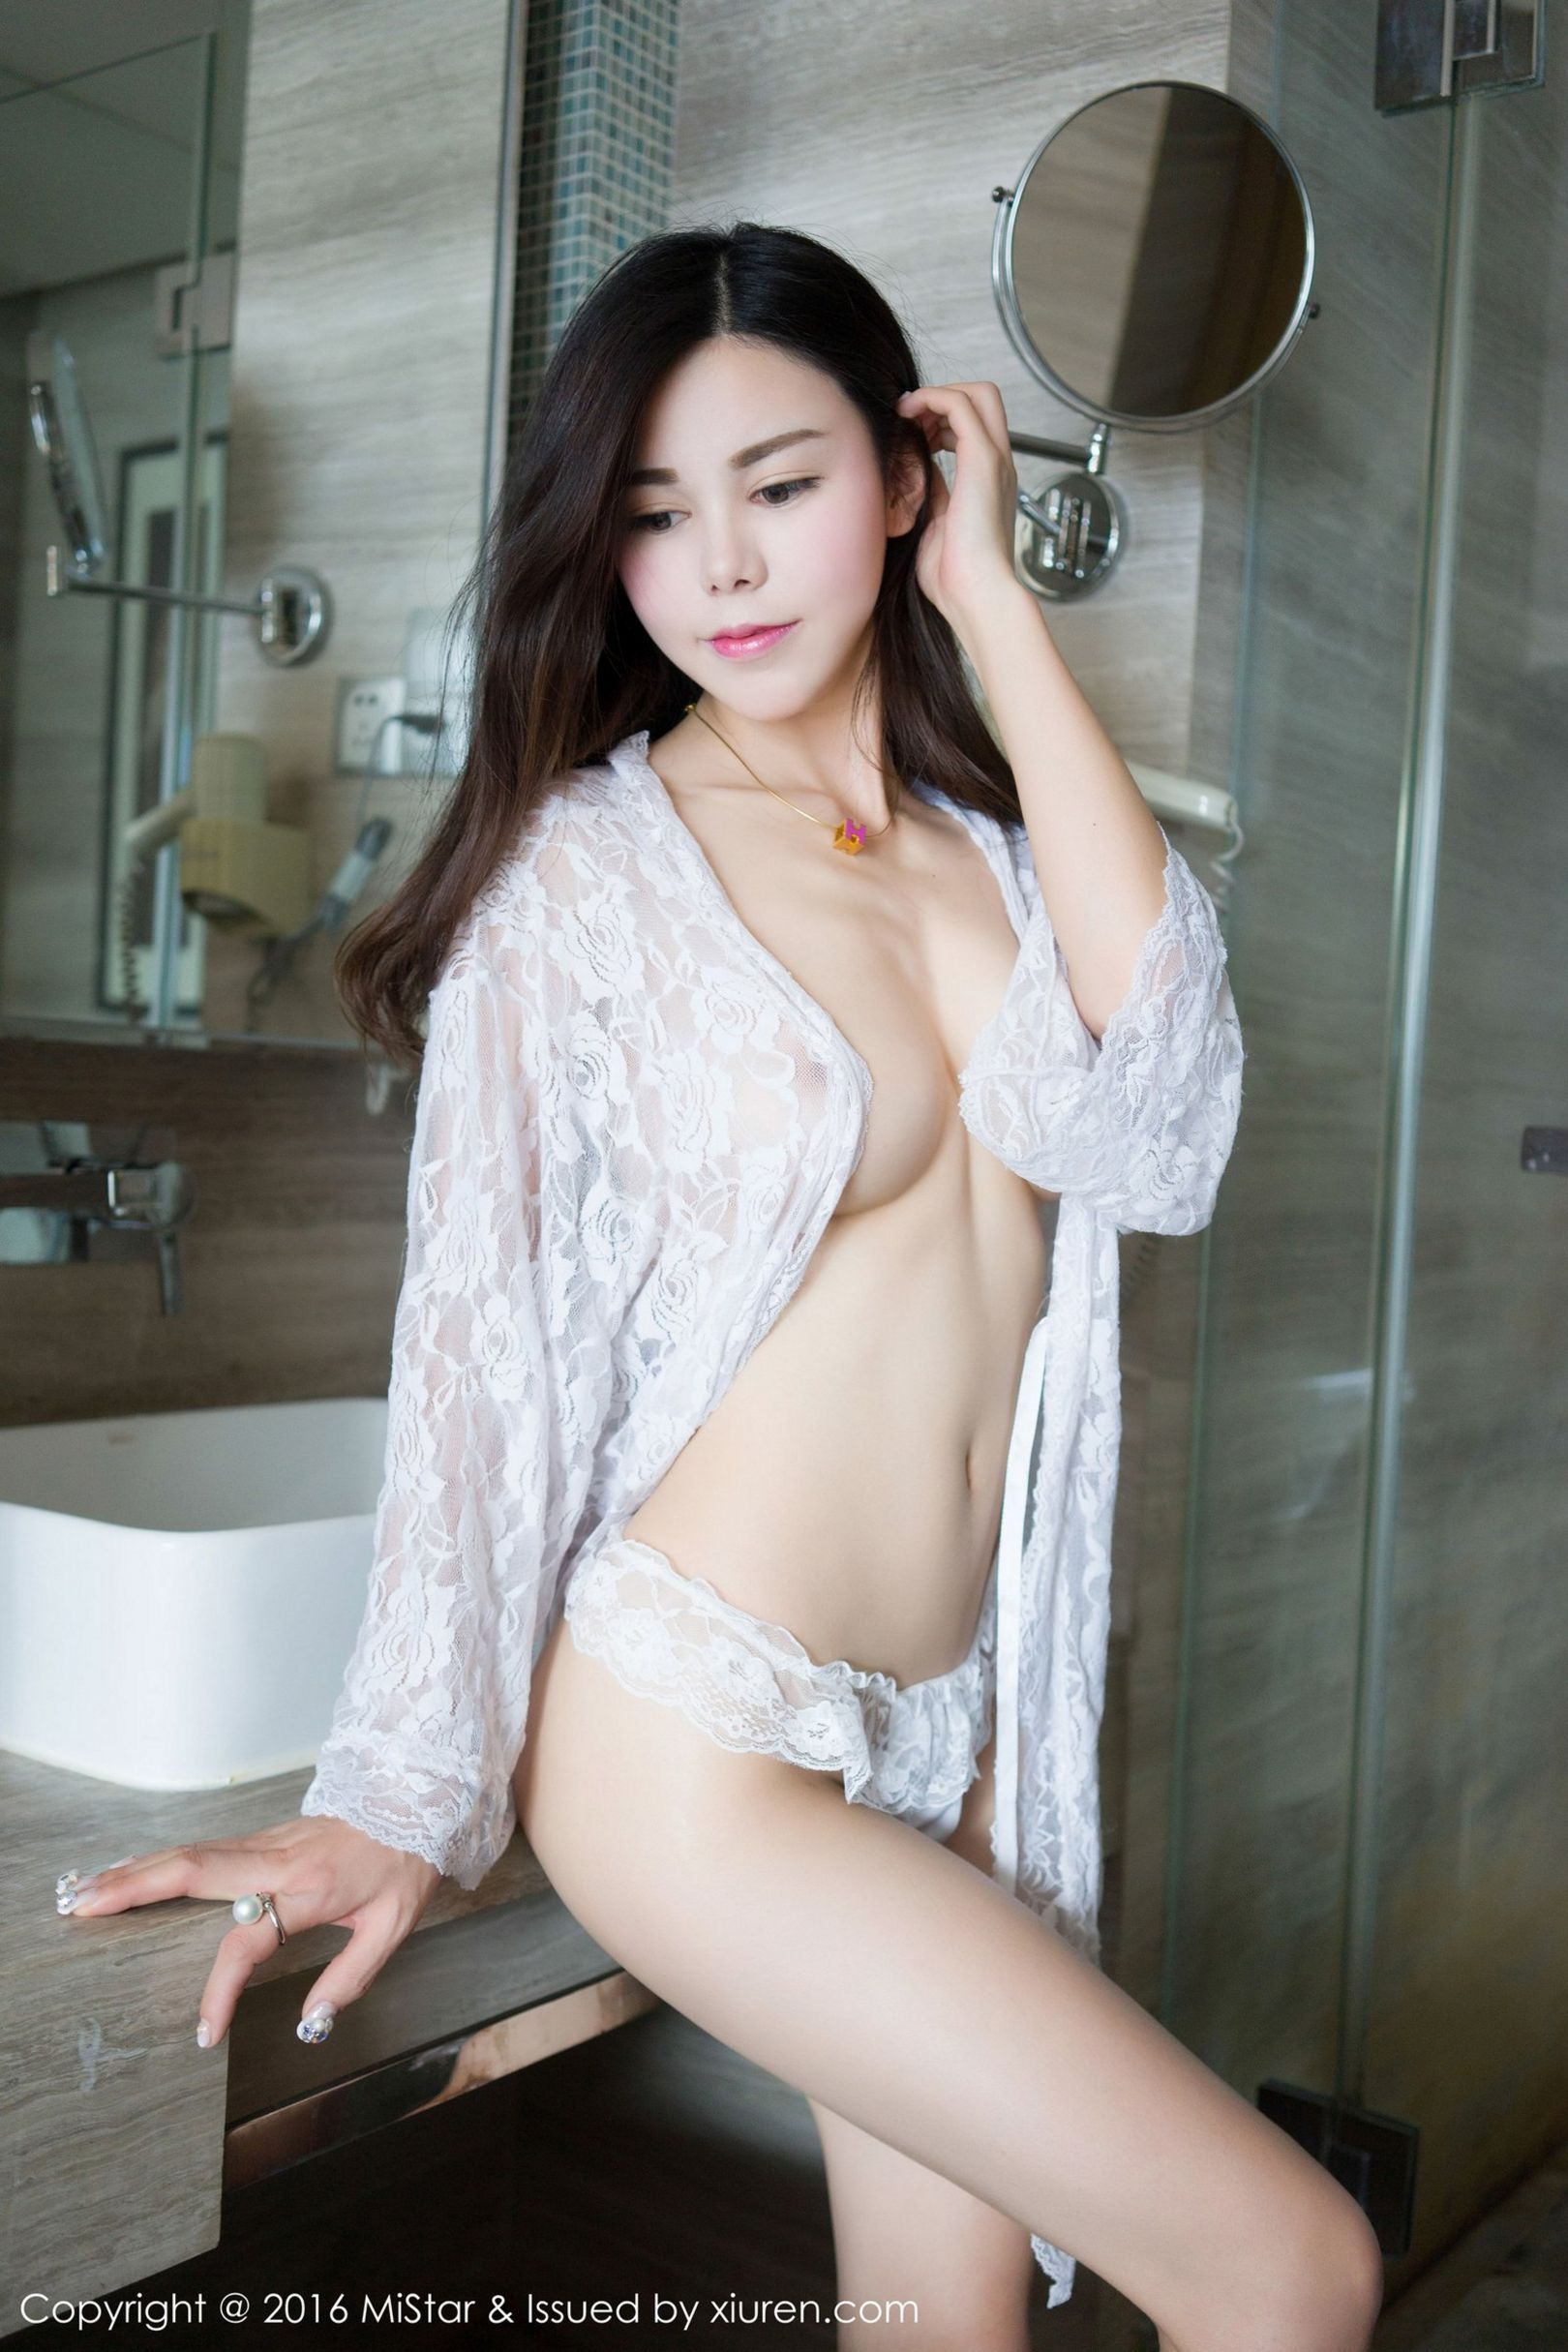 Beautiful chinese nude model li zixi get bondage sex with photographer